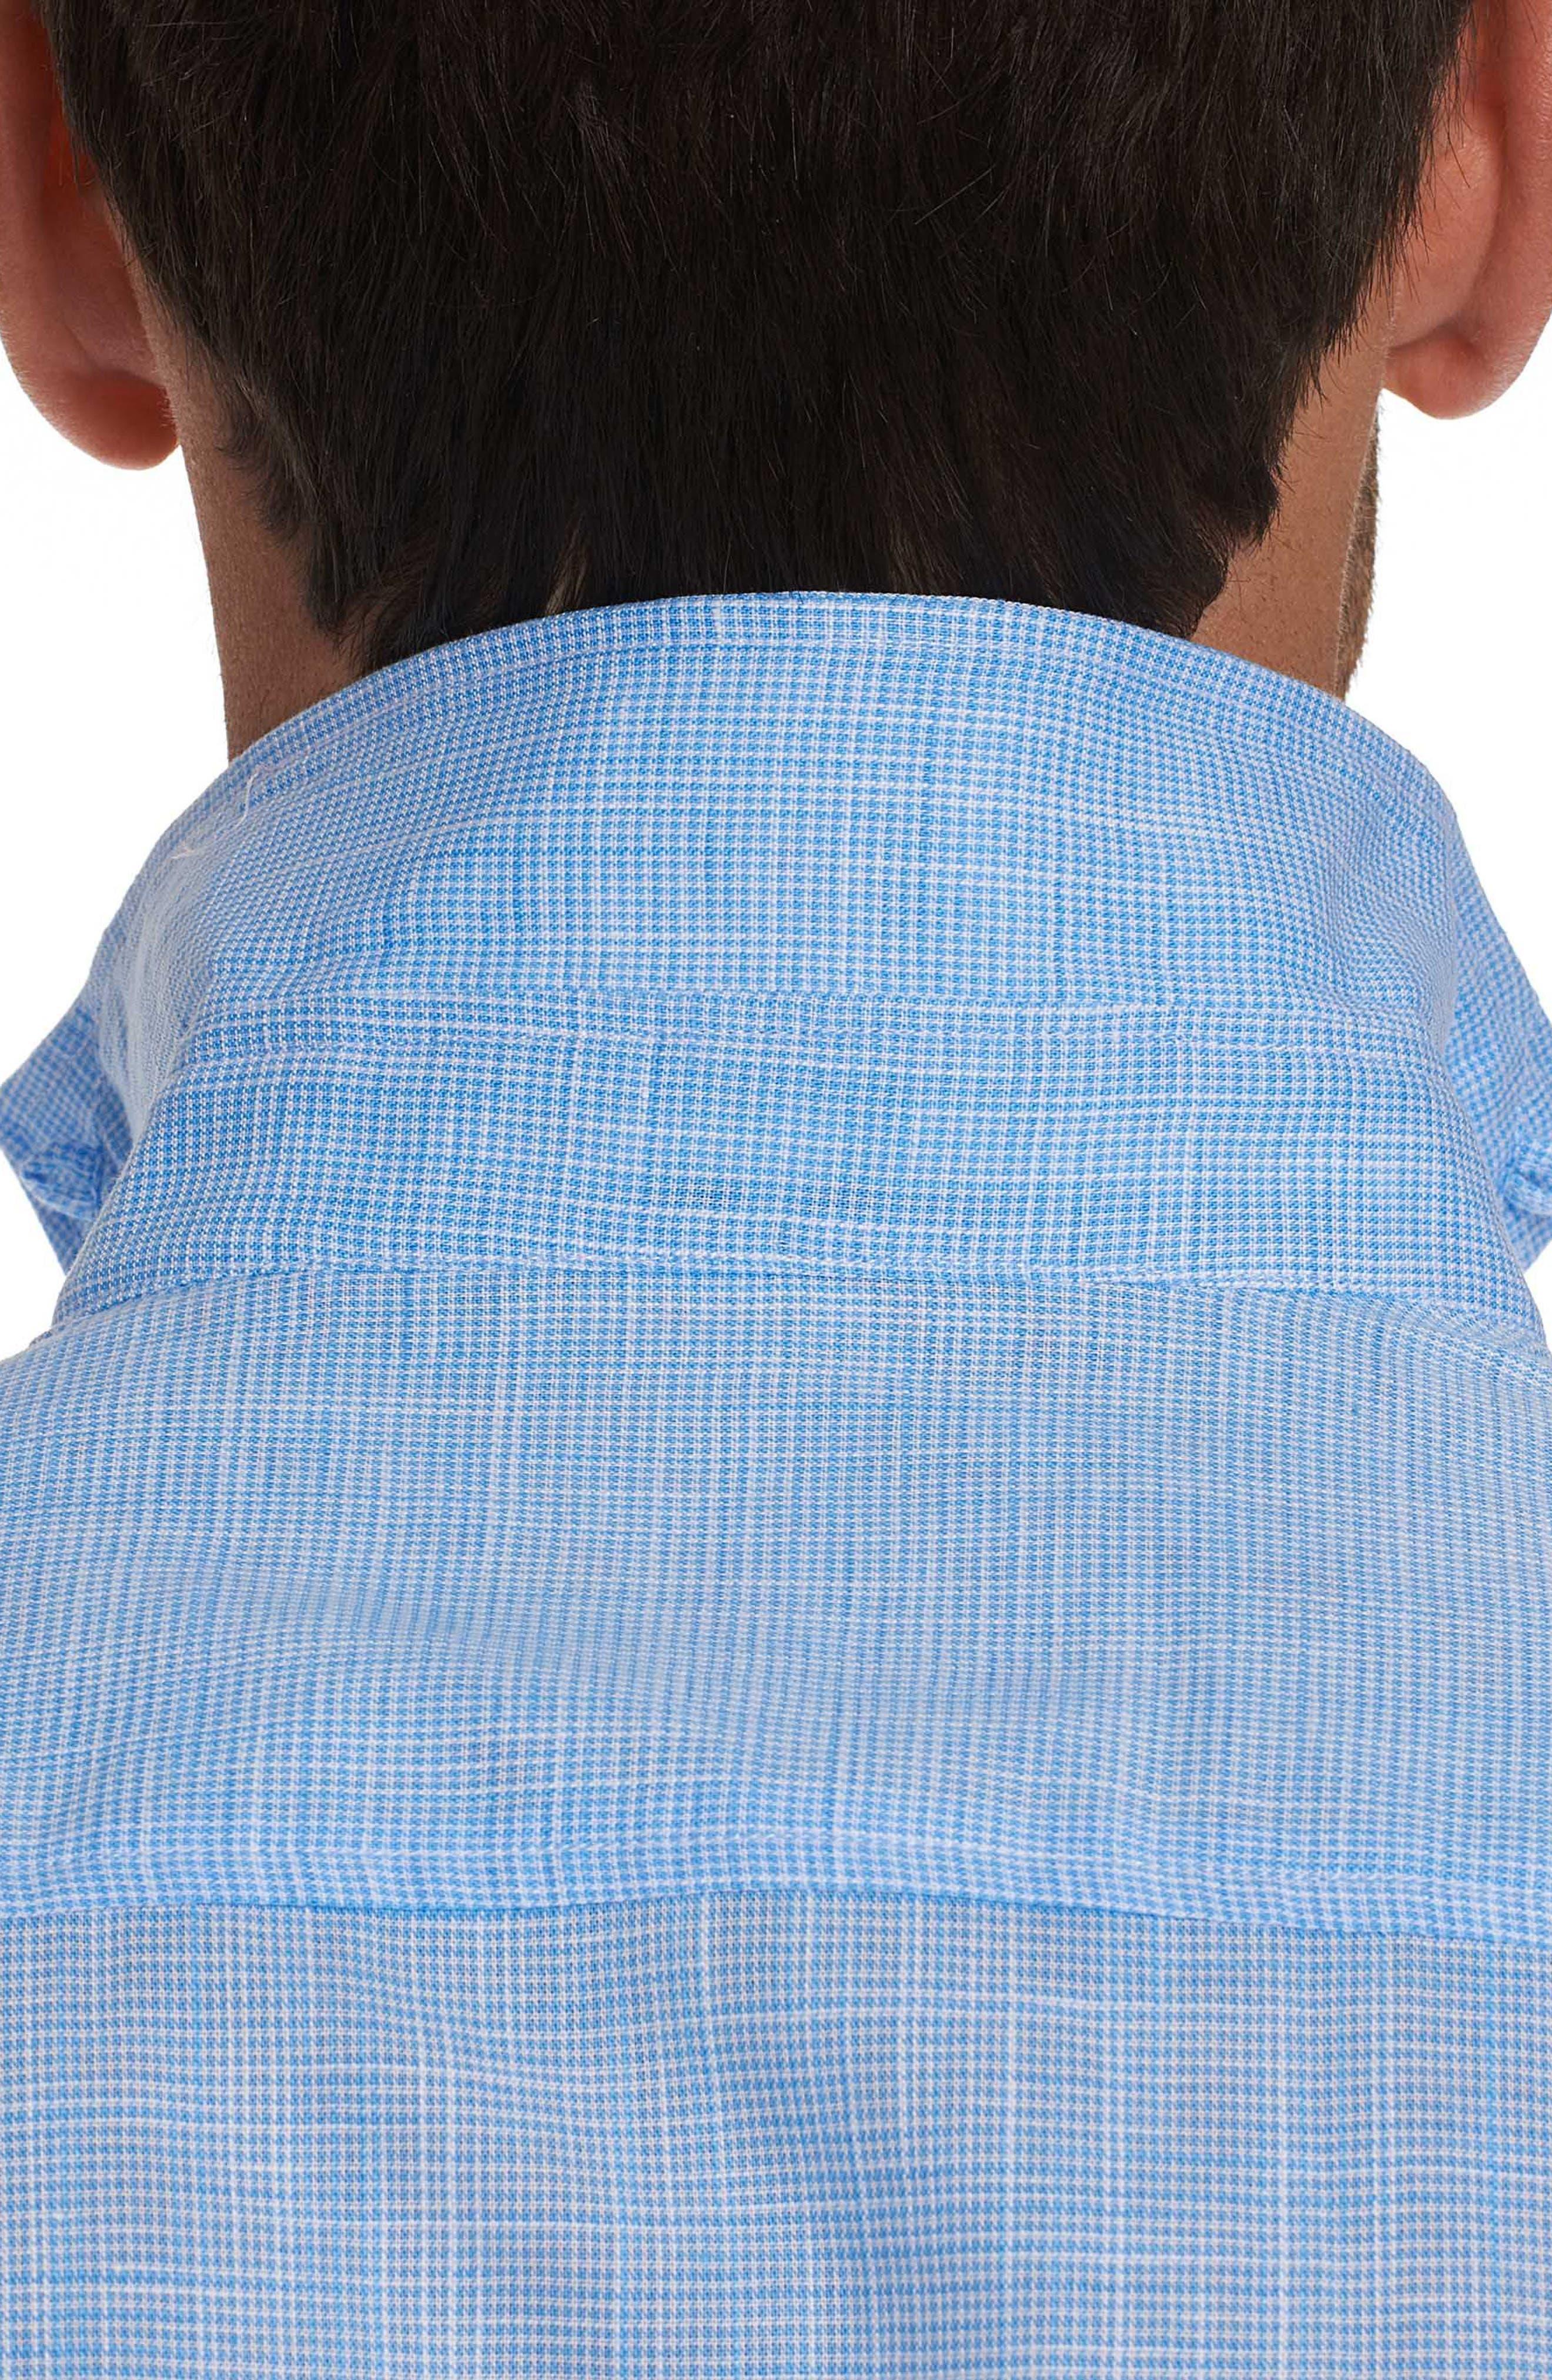 ROBERT GRAHAM,                             Isia Tailored Fit Sport Shirt,                             Alternate thumbnail 7, color,                             400